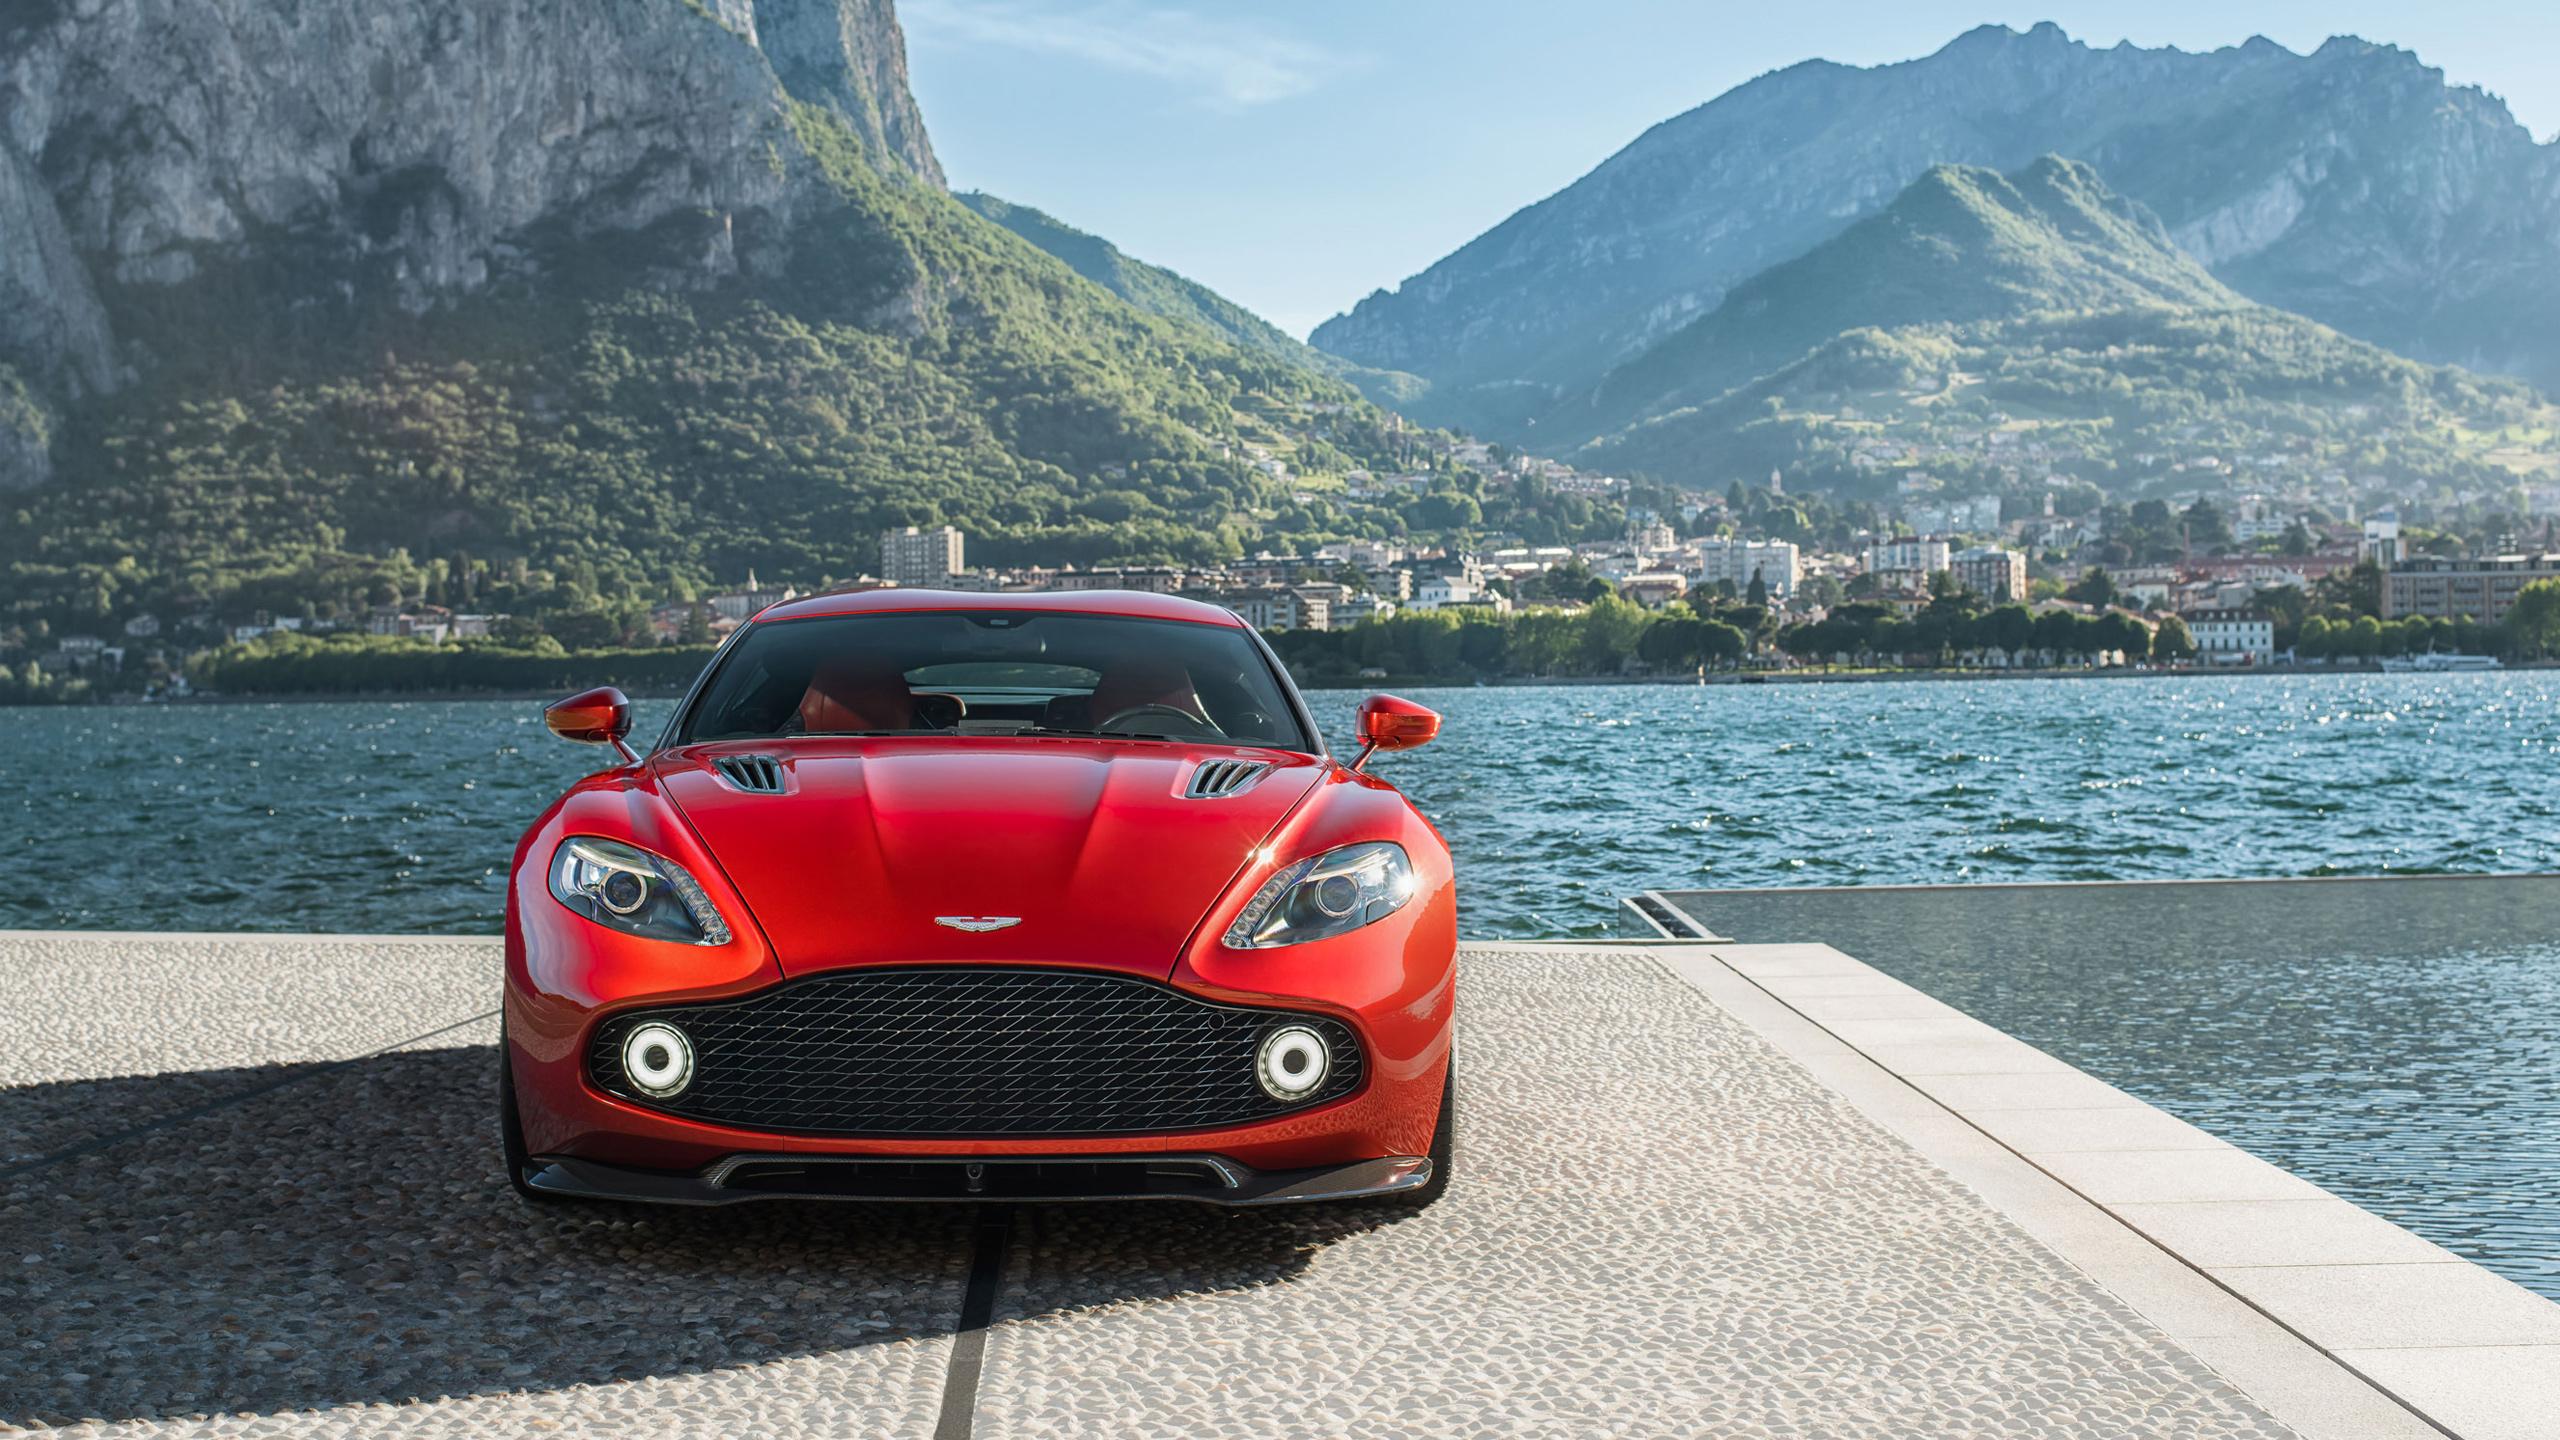 2017 Aston Martin Vanquish Zagato Wallpaper | HD Car ...